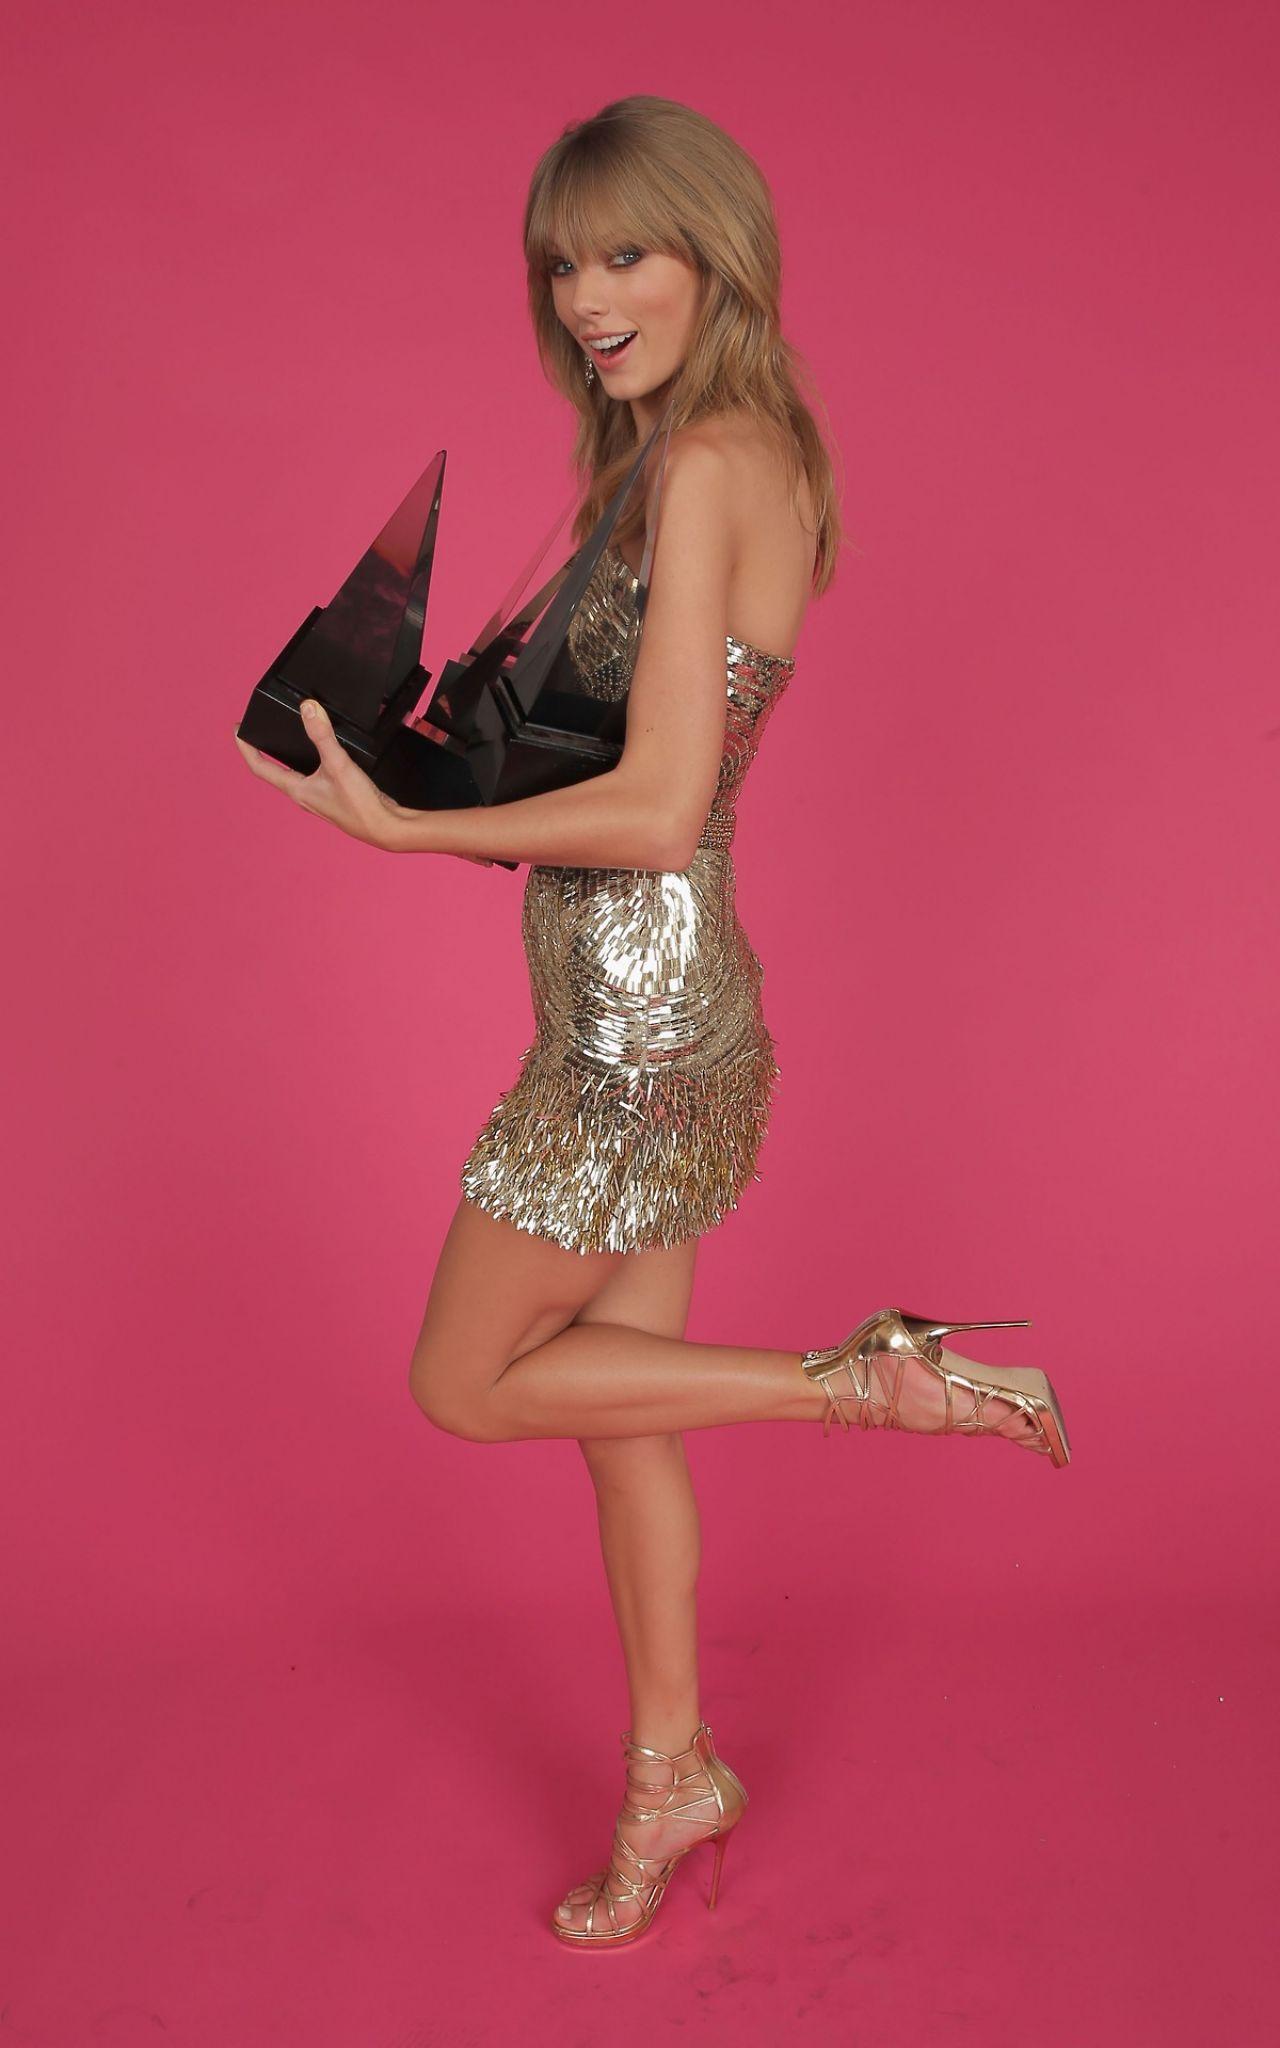 Taylor Swift Photoshoot - 2013 American Music Awards Portraits-1518